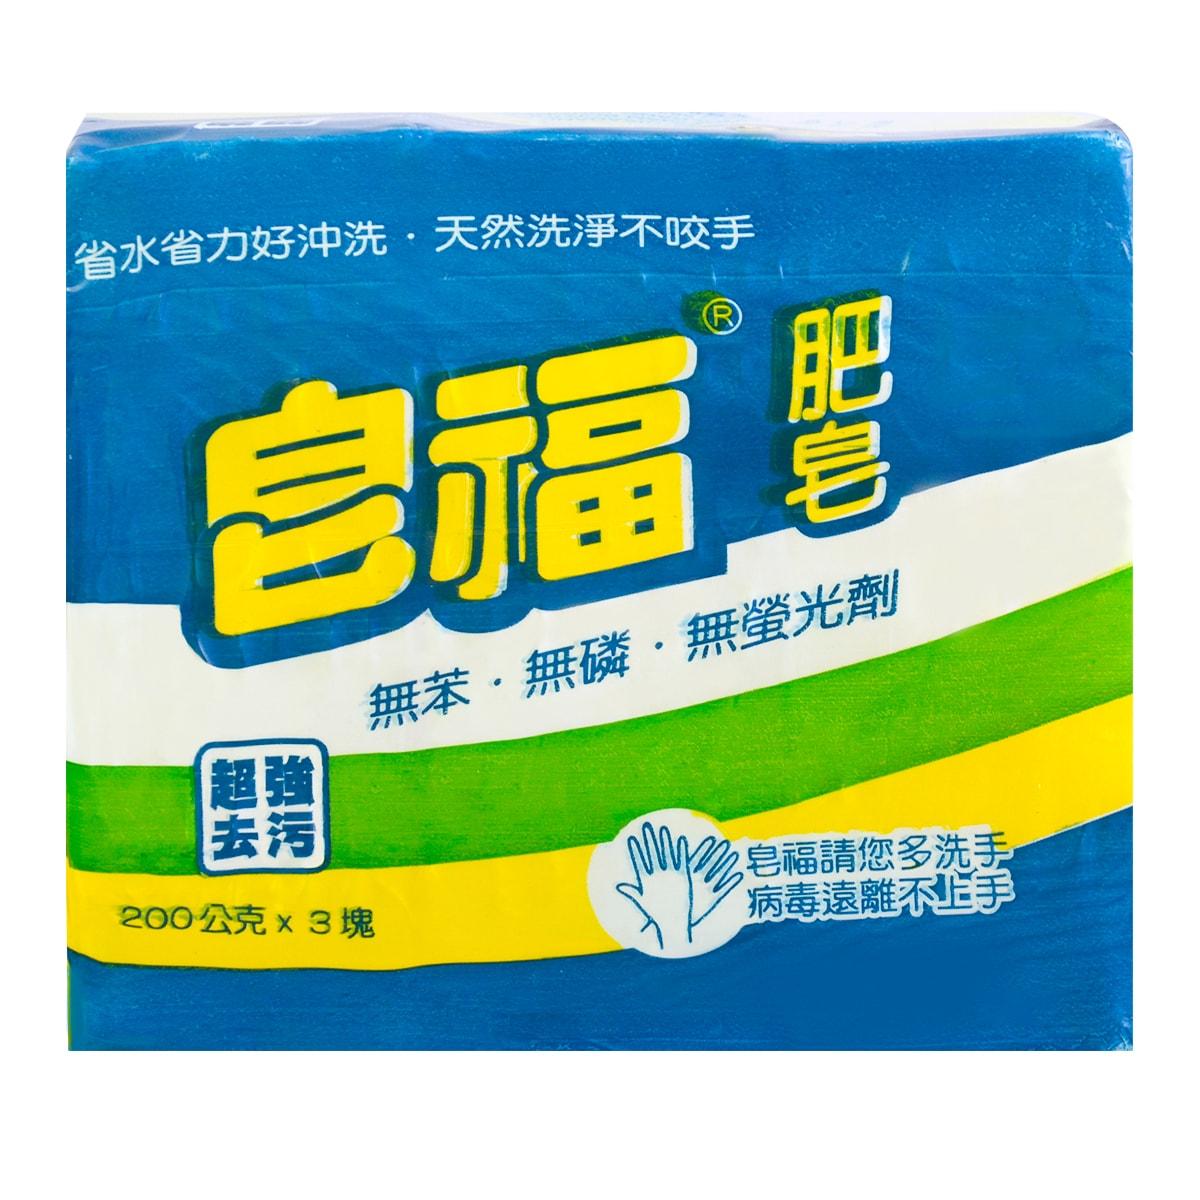 ZAOFU All Natural Multipurpose Laundry Bar Soap 3pcsx200g